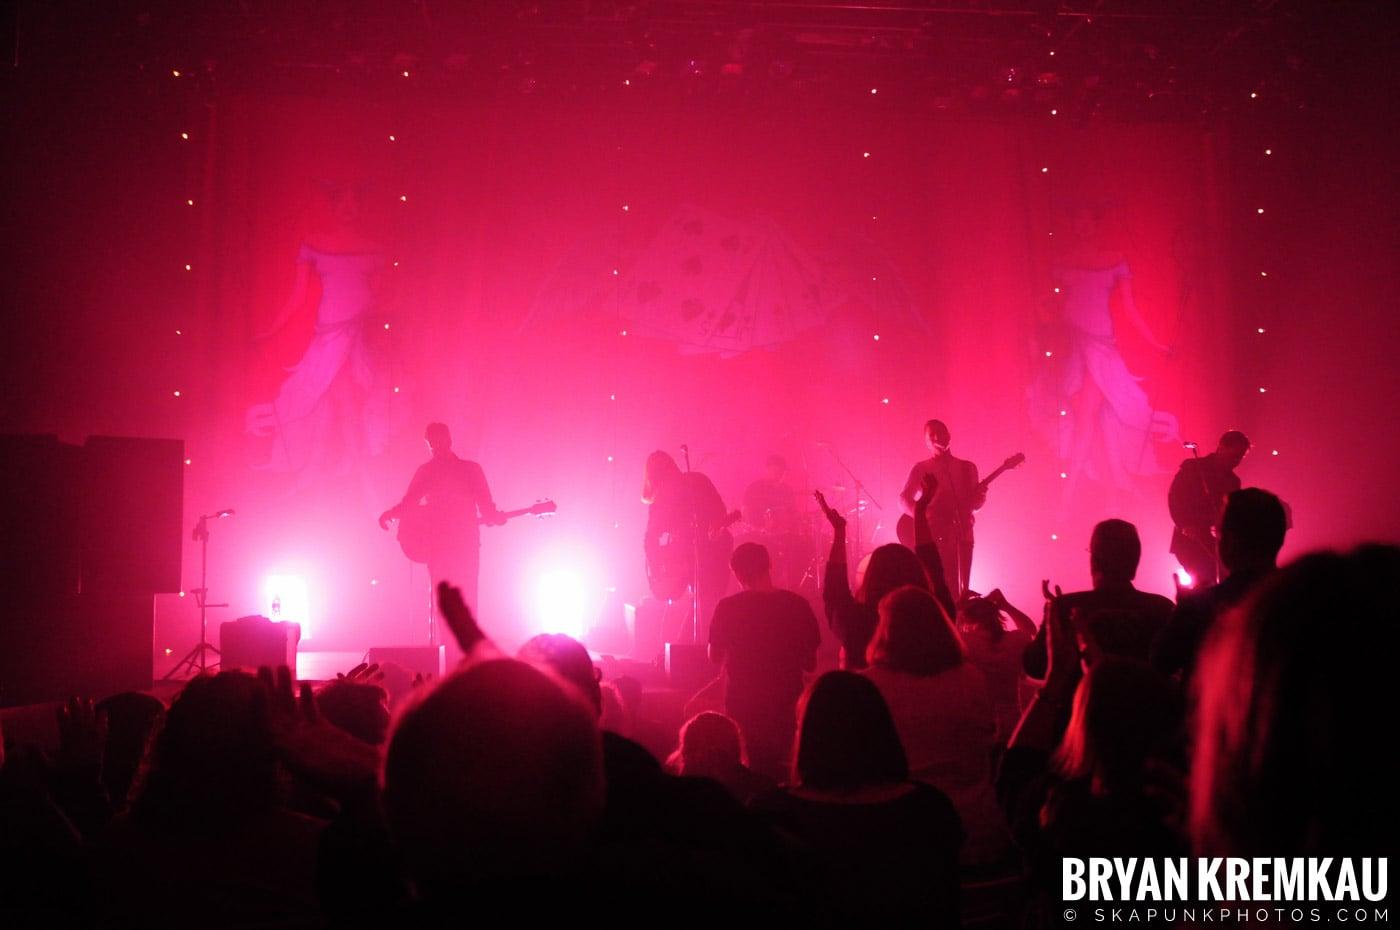 Great Big Sea @ South Orange Performing Arts Center, NJ - 10.30.08 (2)